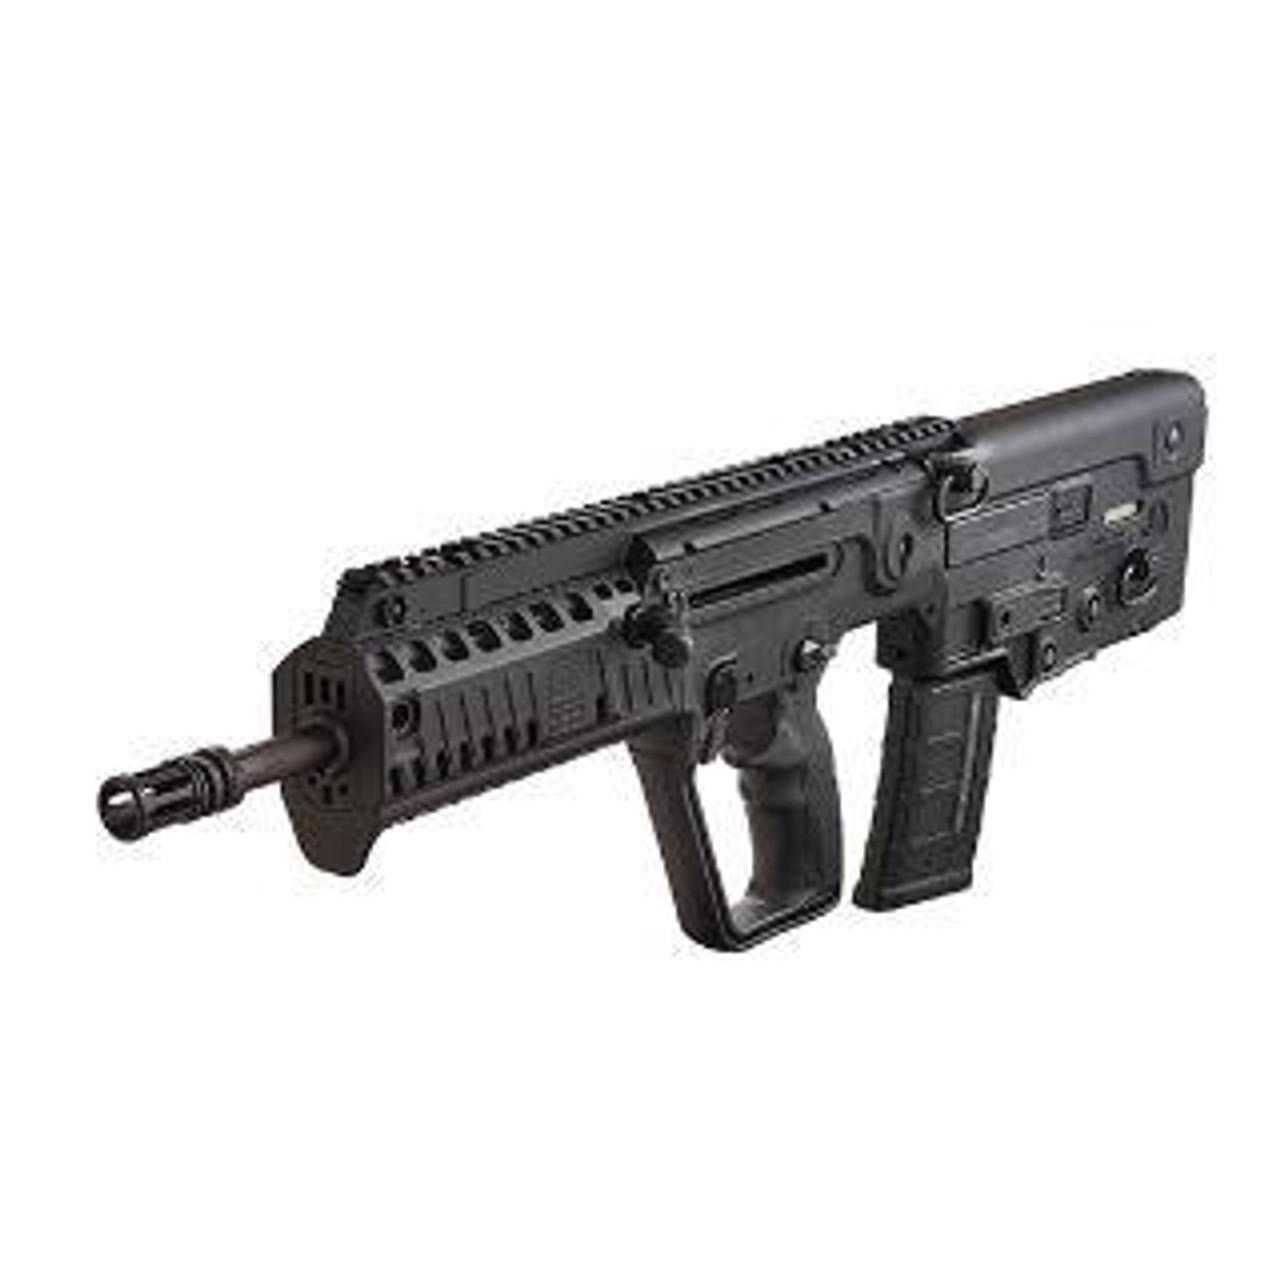 IWI Tavor X95 16in Left-Handed CALIFORNIA LEGAL- 5.56- Black